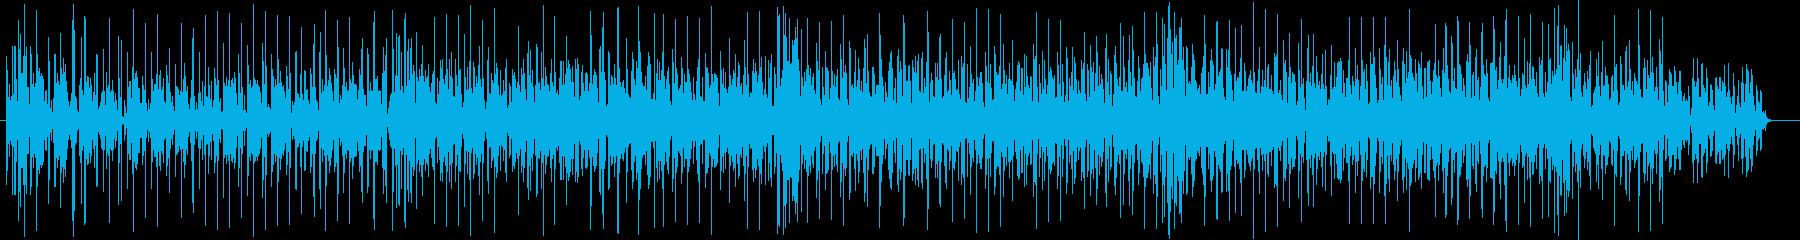 Minor and fantastic techno pop's reproduced waveform